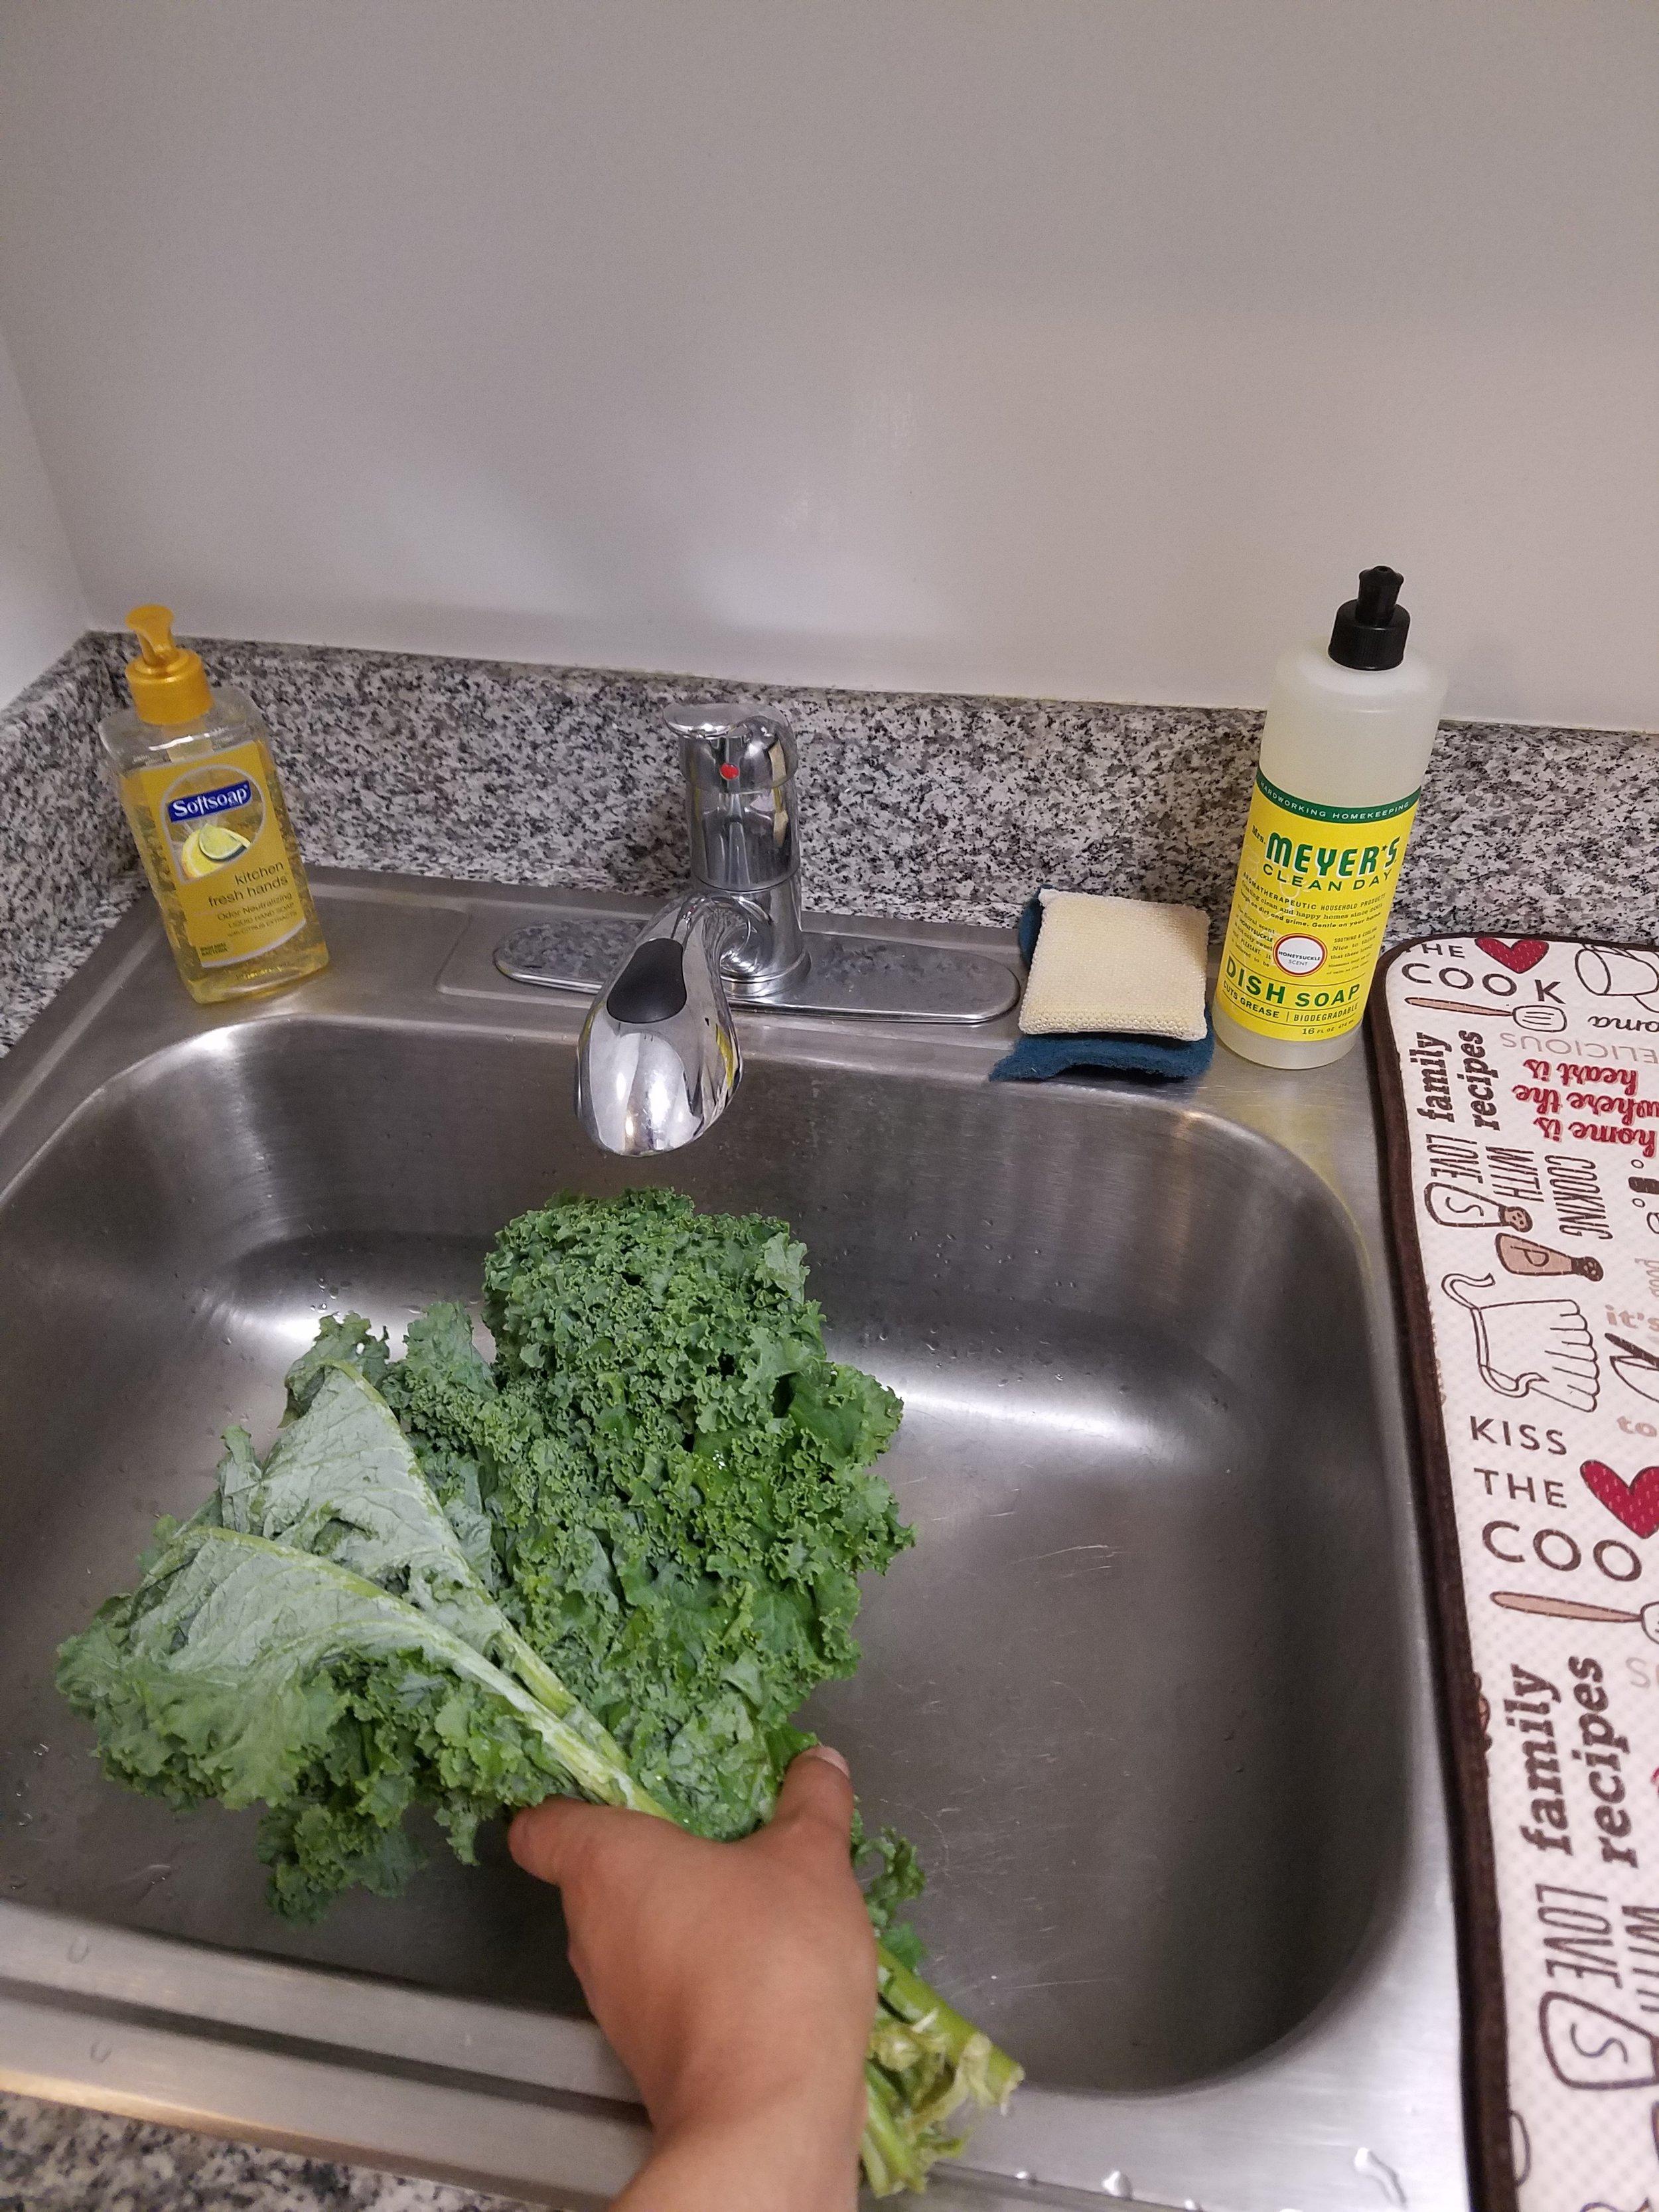 Chef_d Smoky Maple Pork Loin Wash Kale.jpg